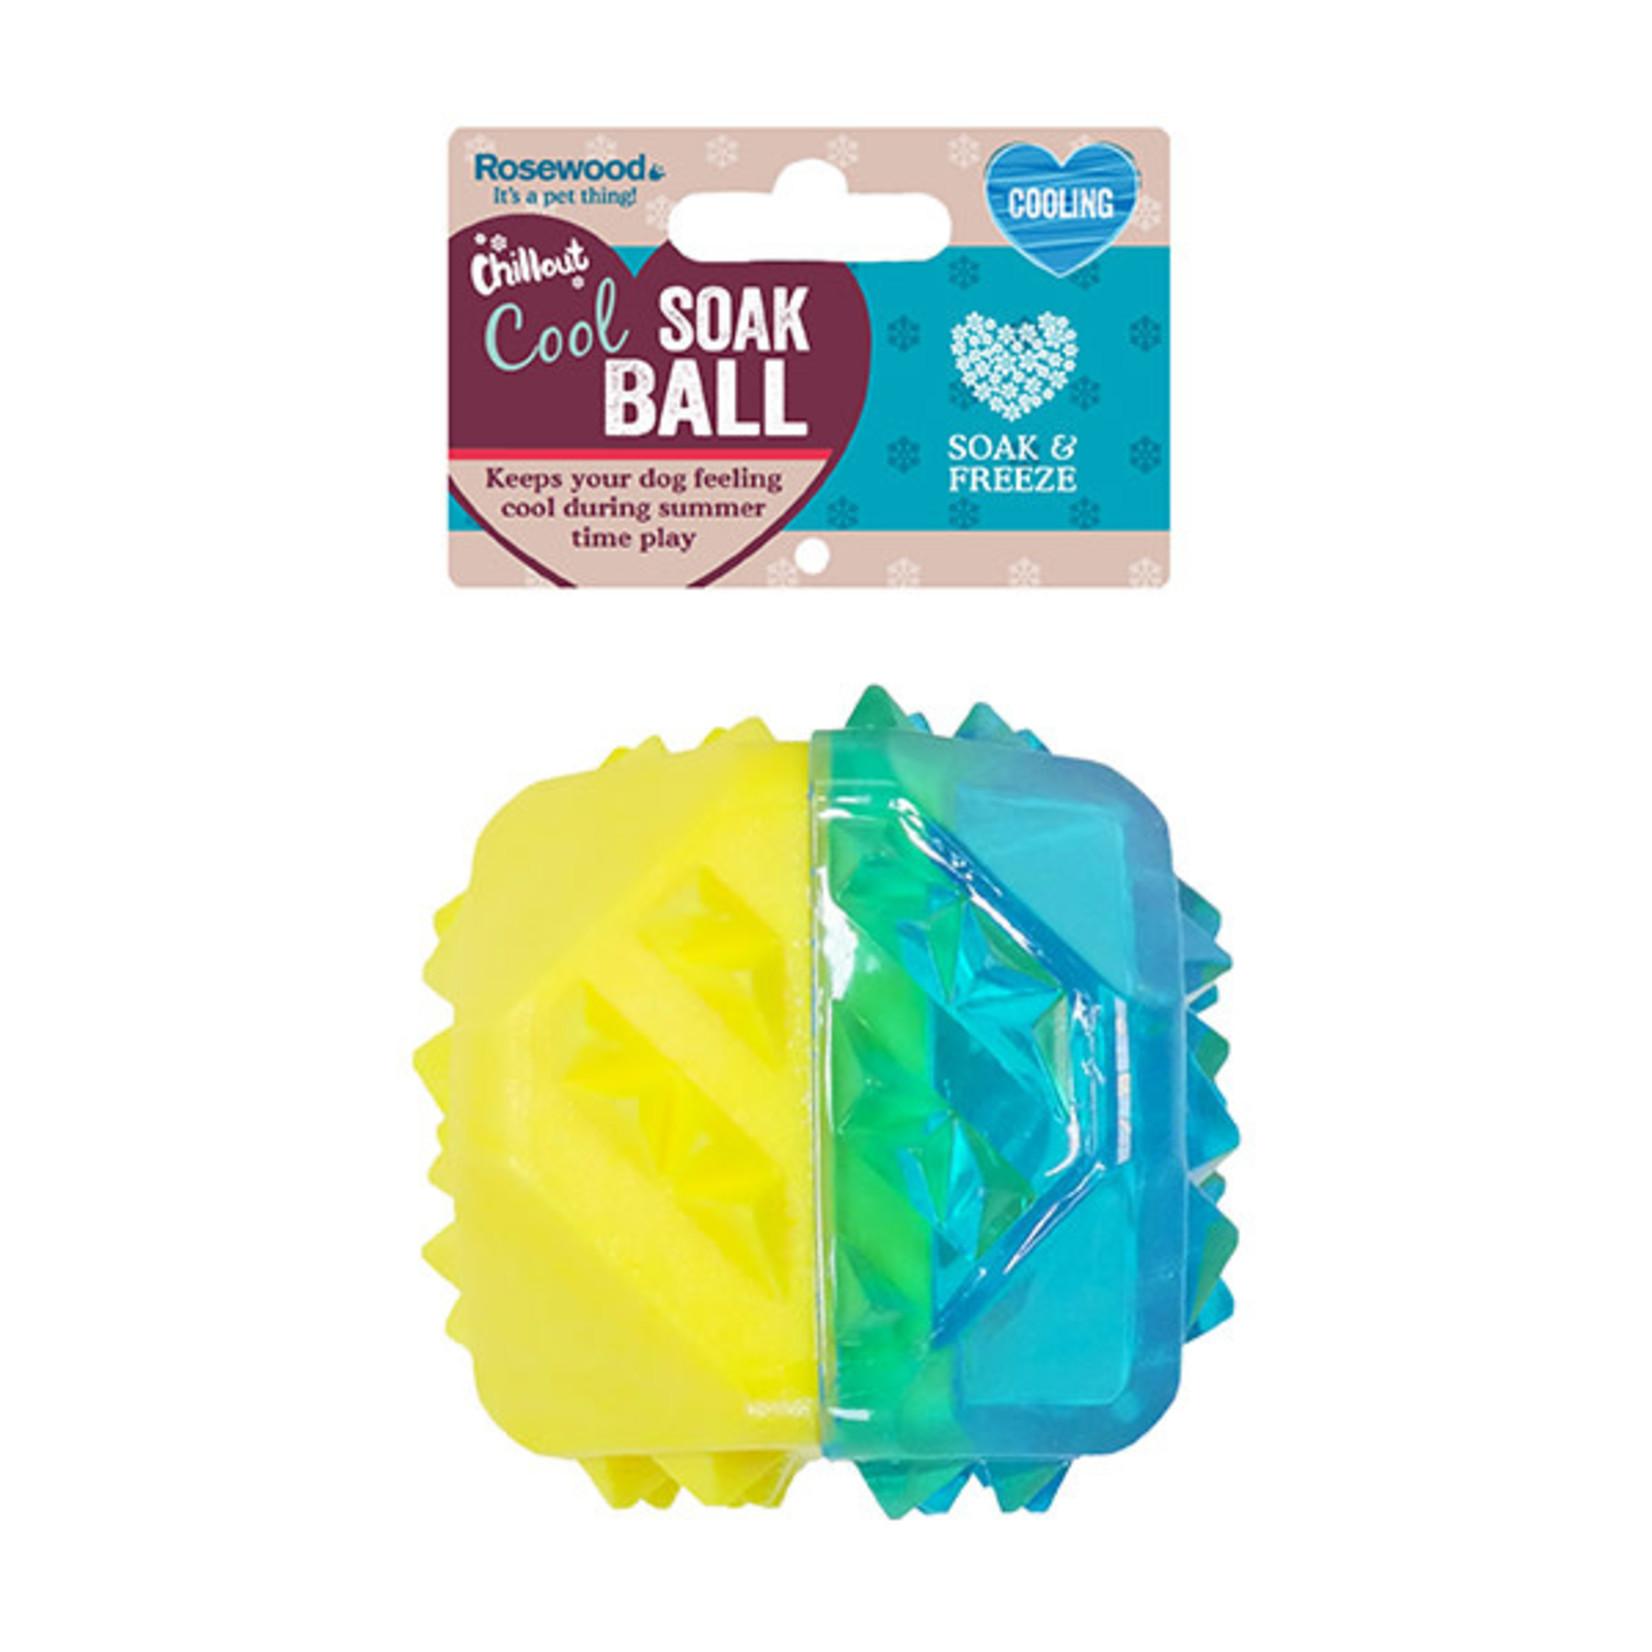 Rosewood Chillax Cool Soak Ball Dog Toy